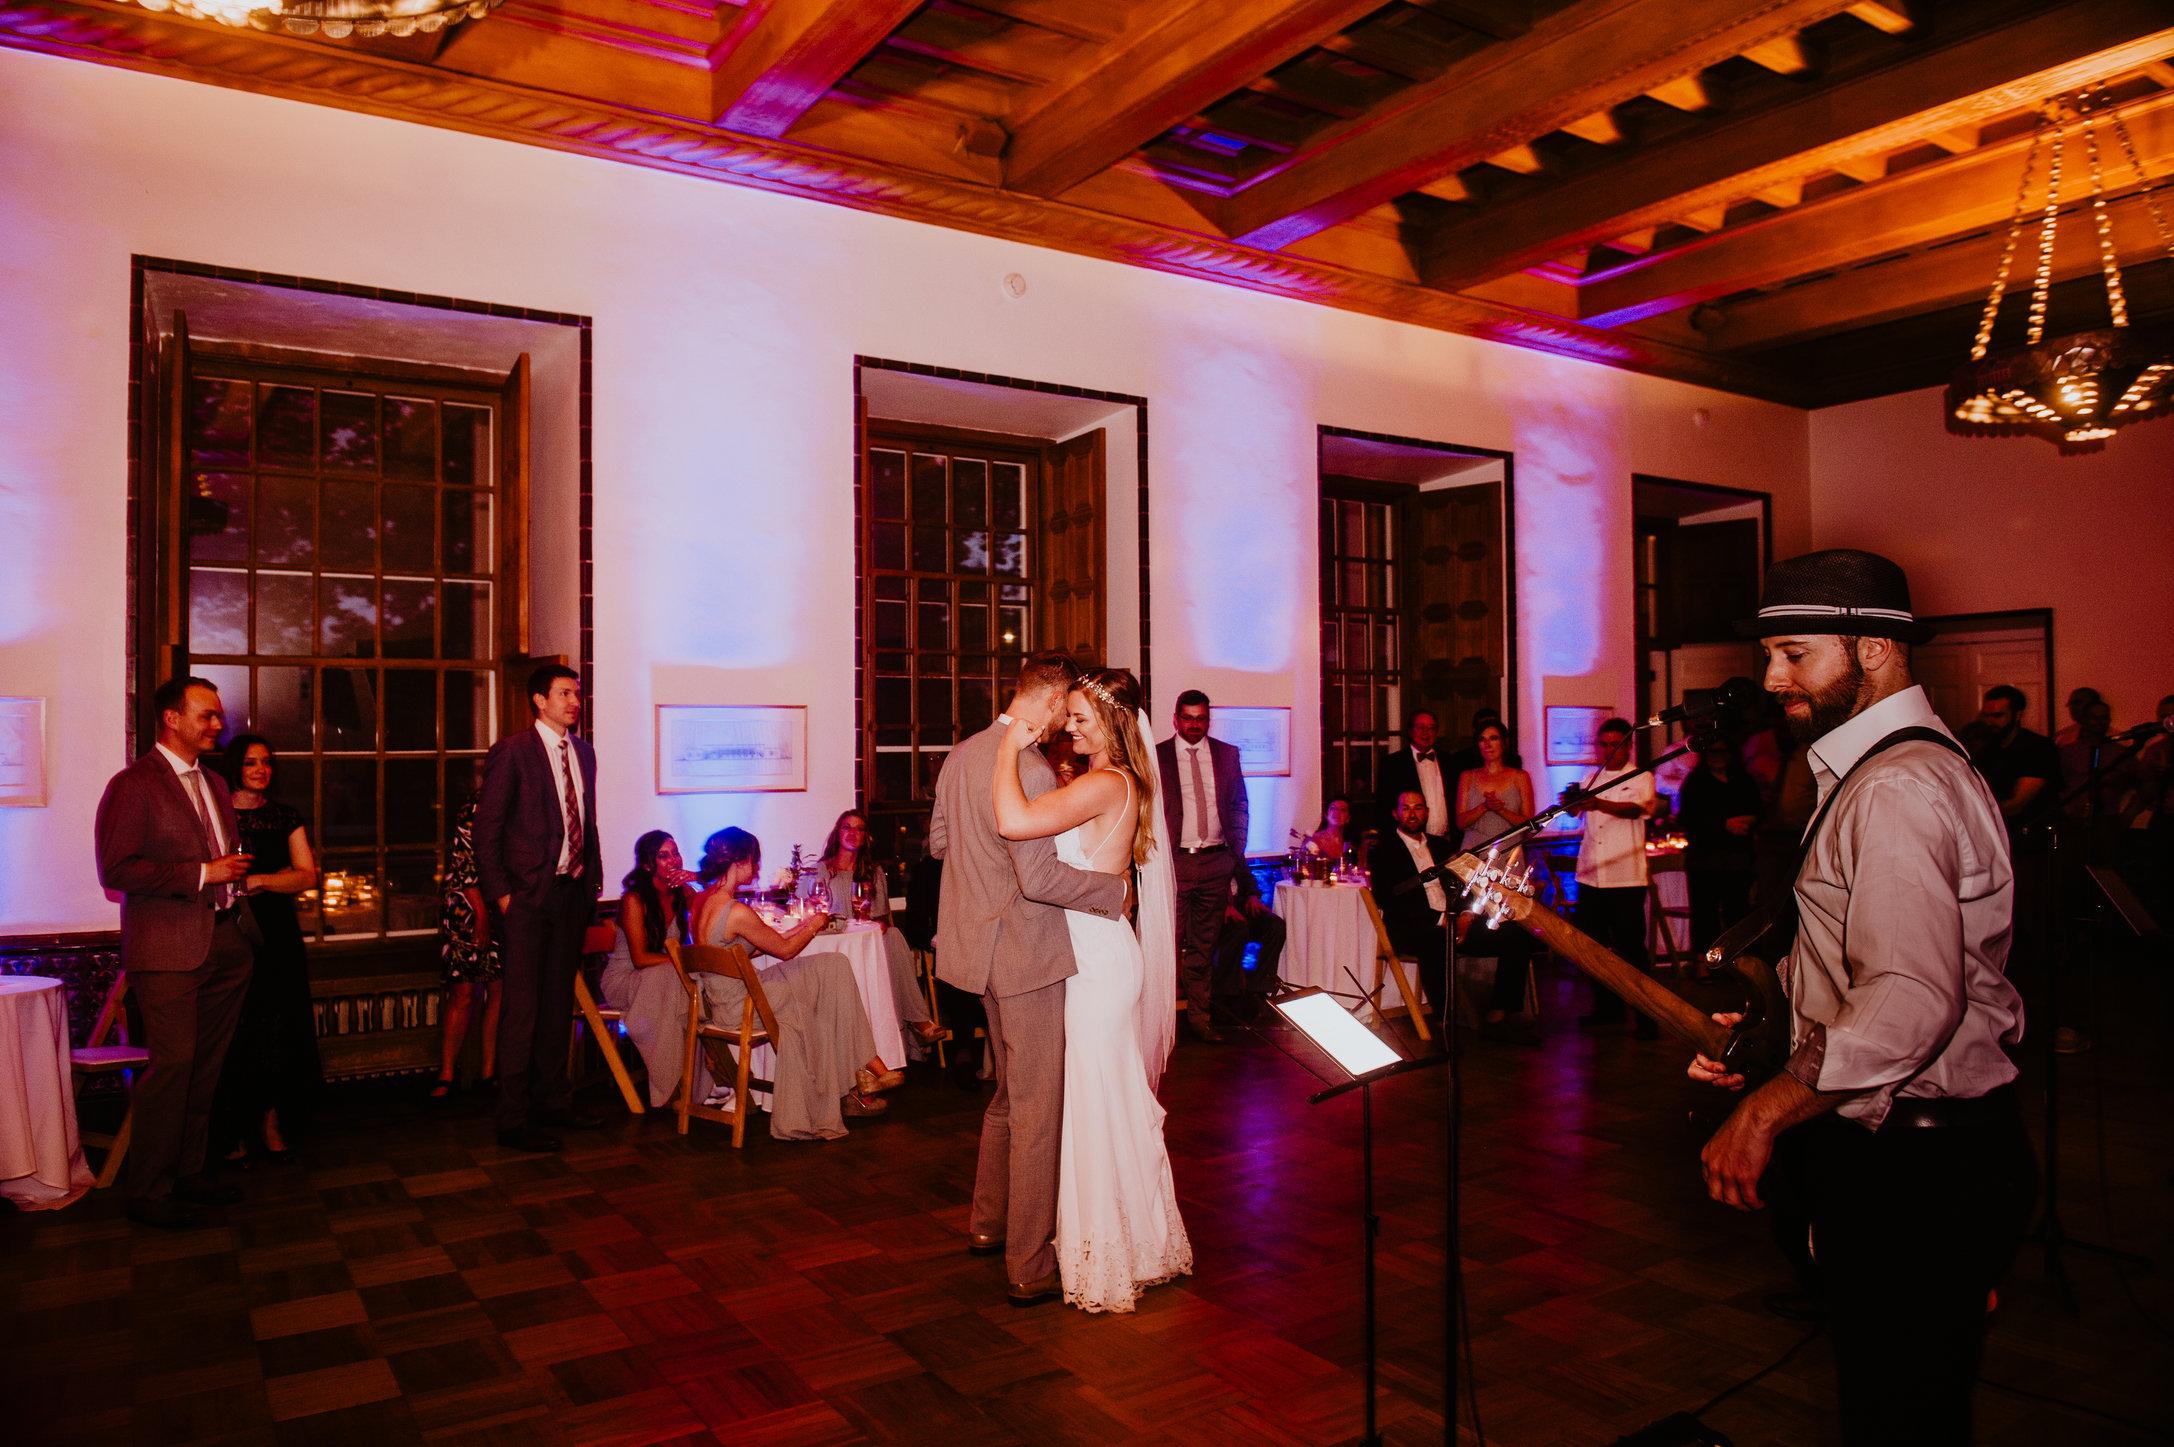 DandA-wedding-801.jpg